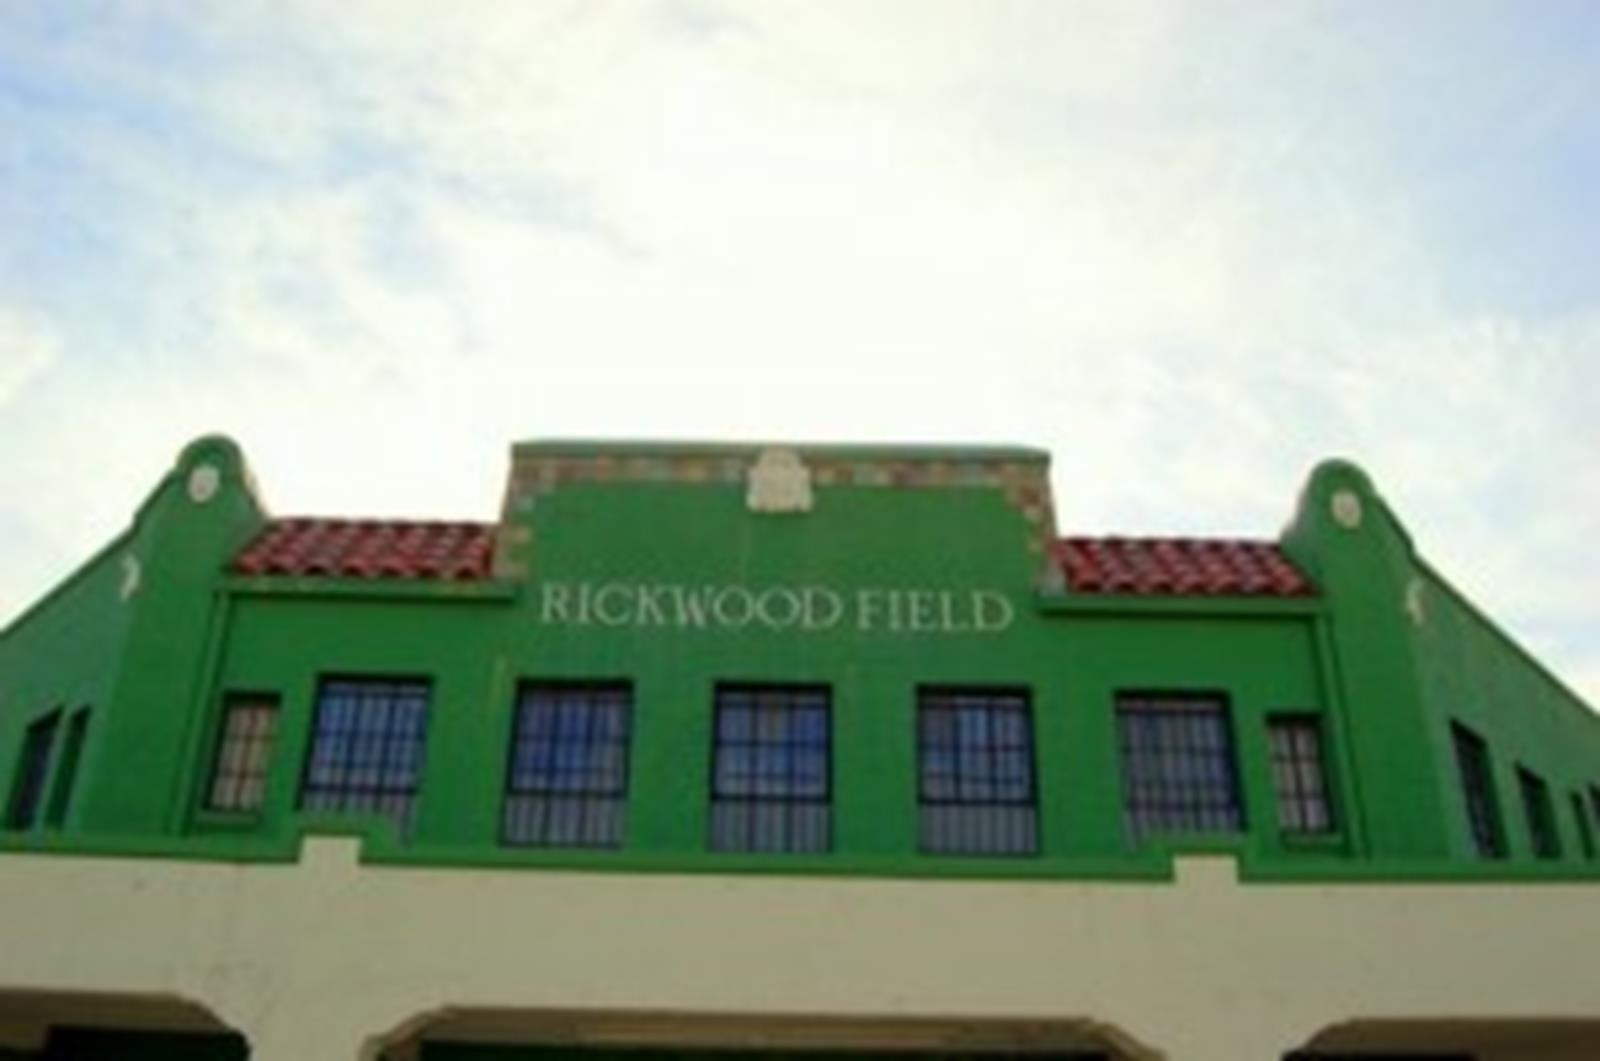 Rickwood Field